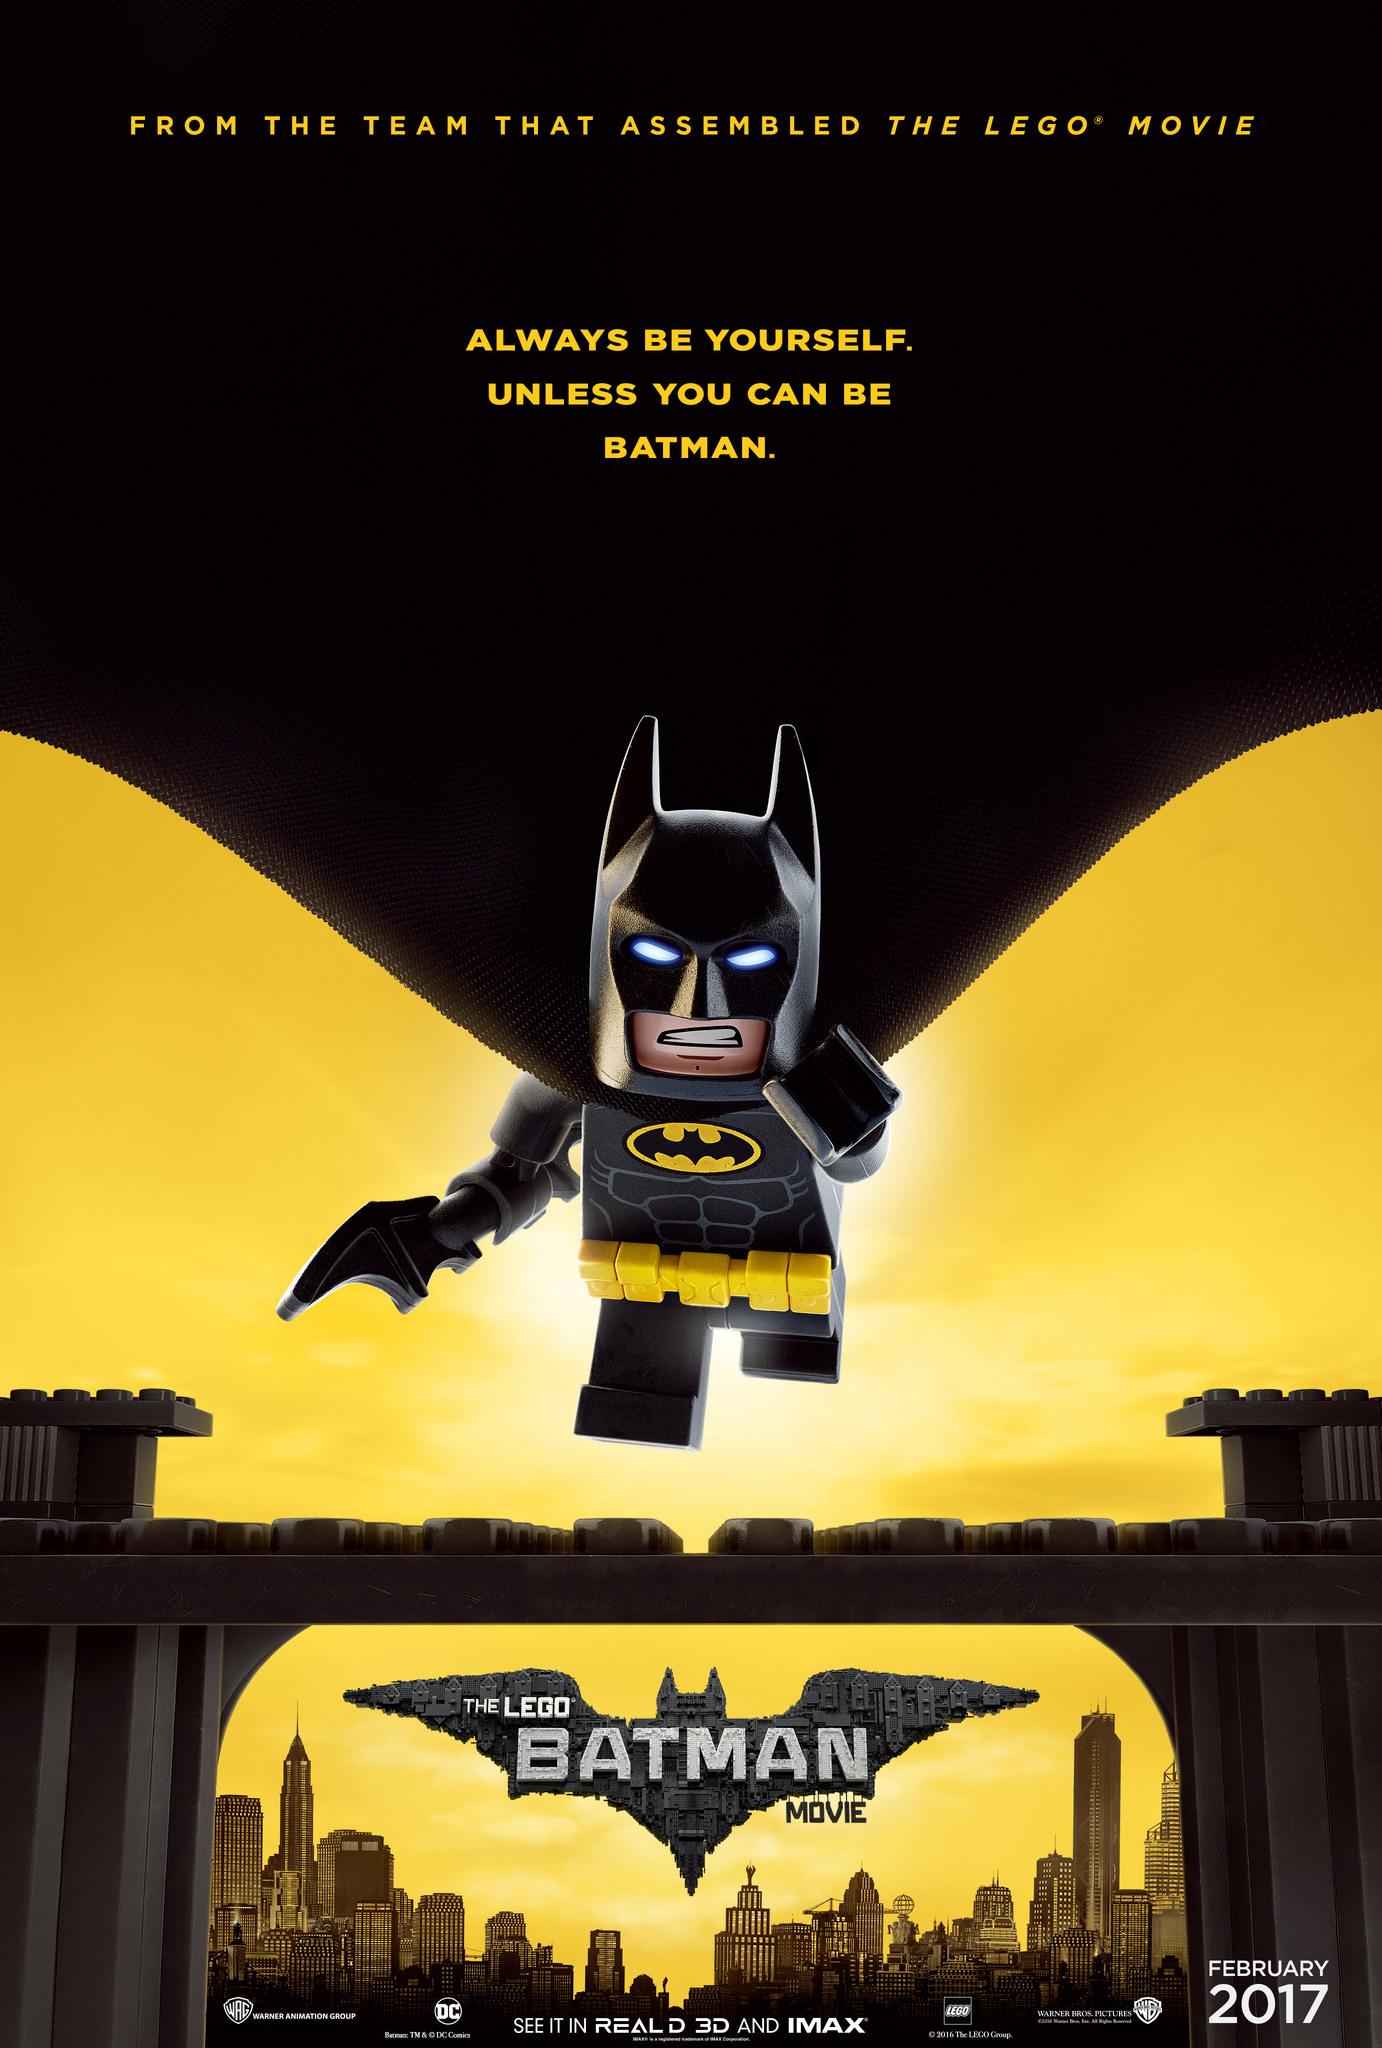 The Lego Batman Movie(2017) - Vision Filme